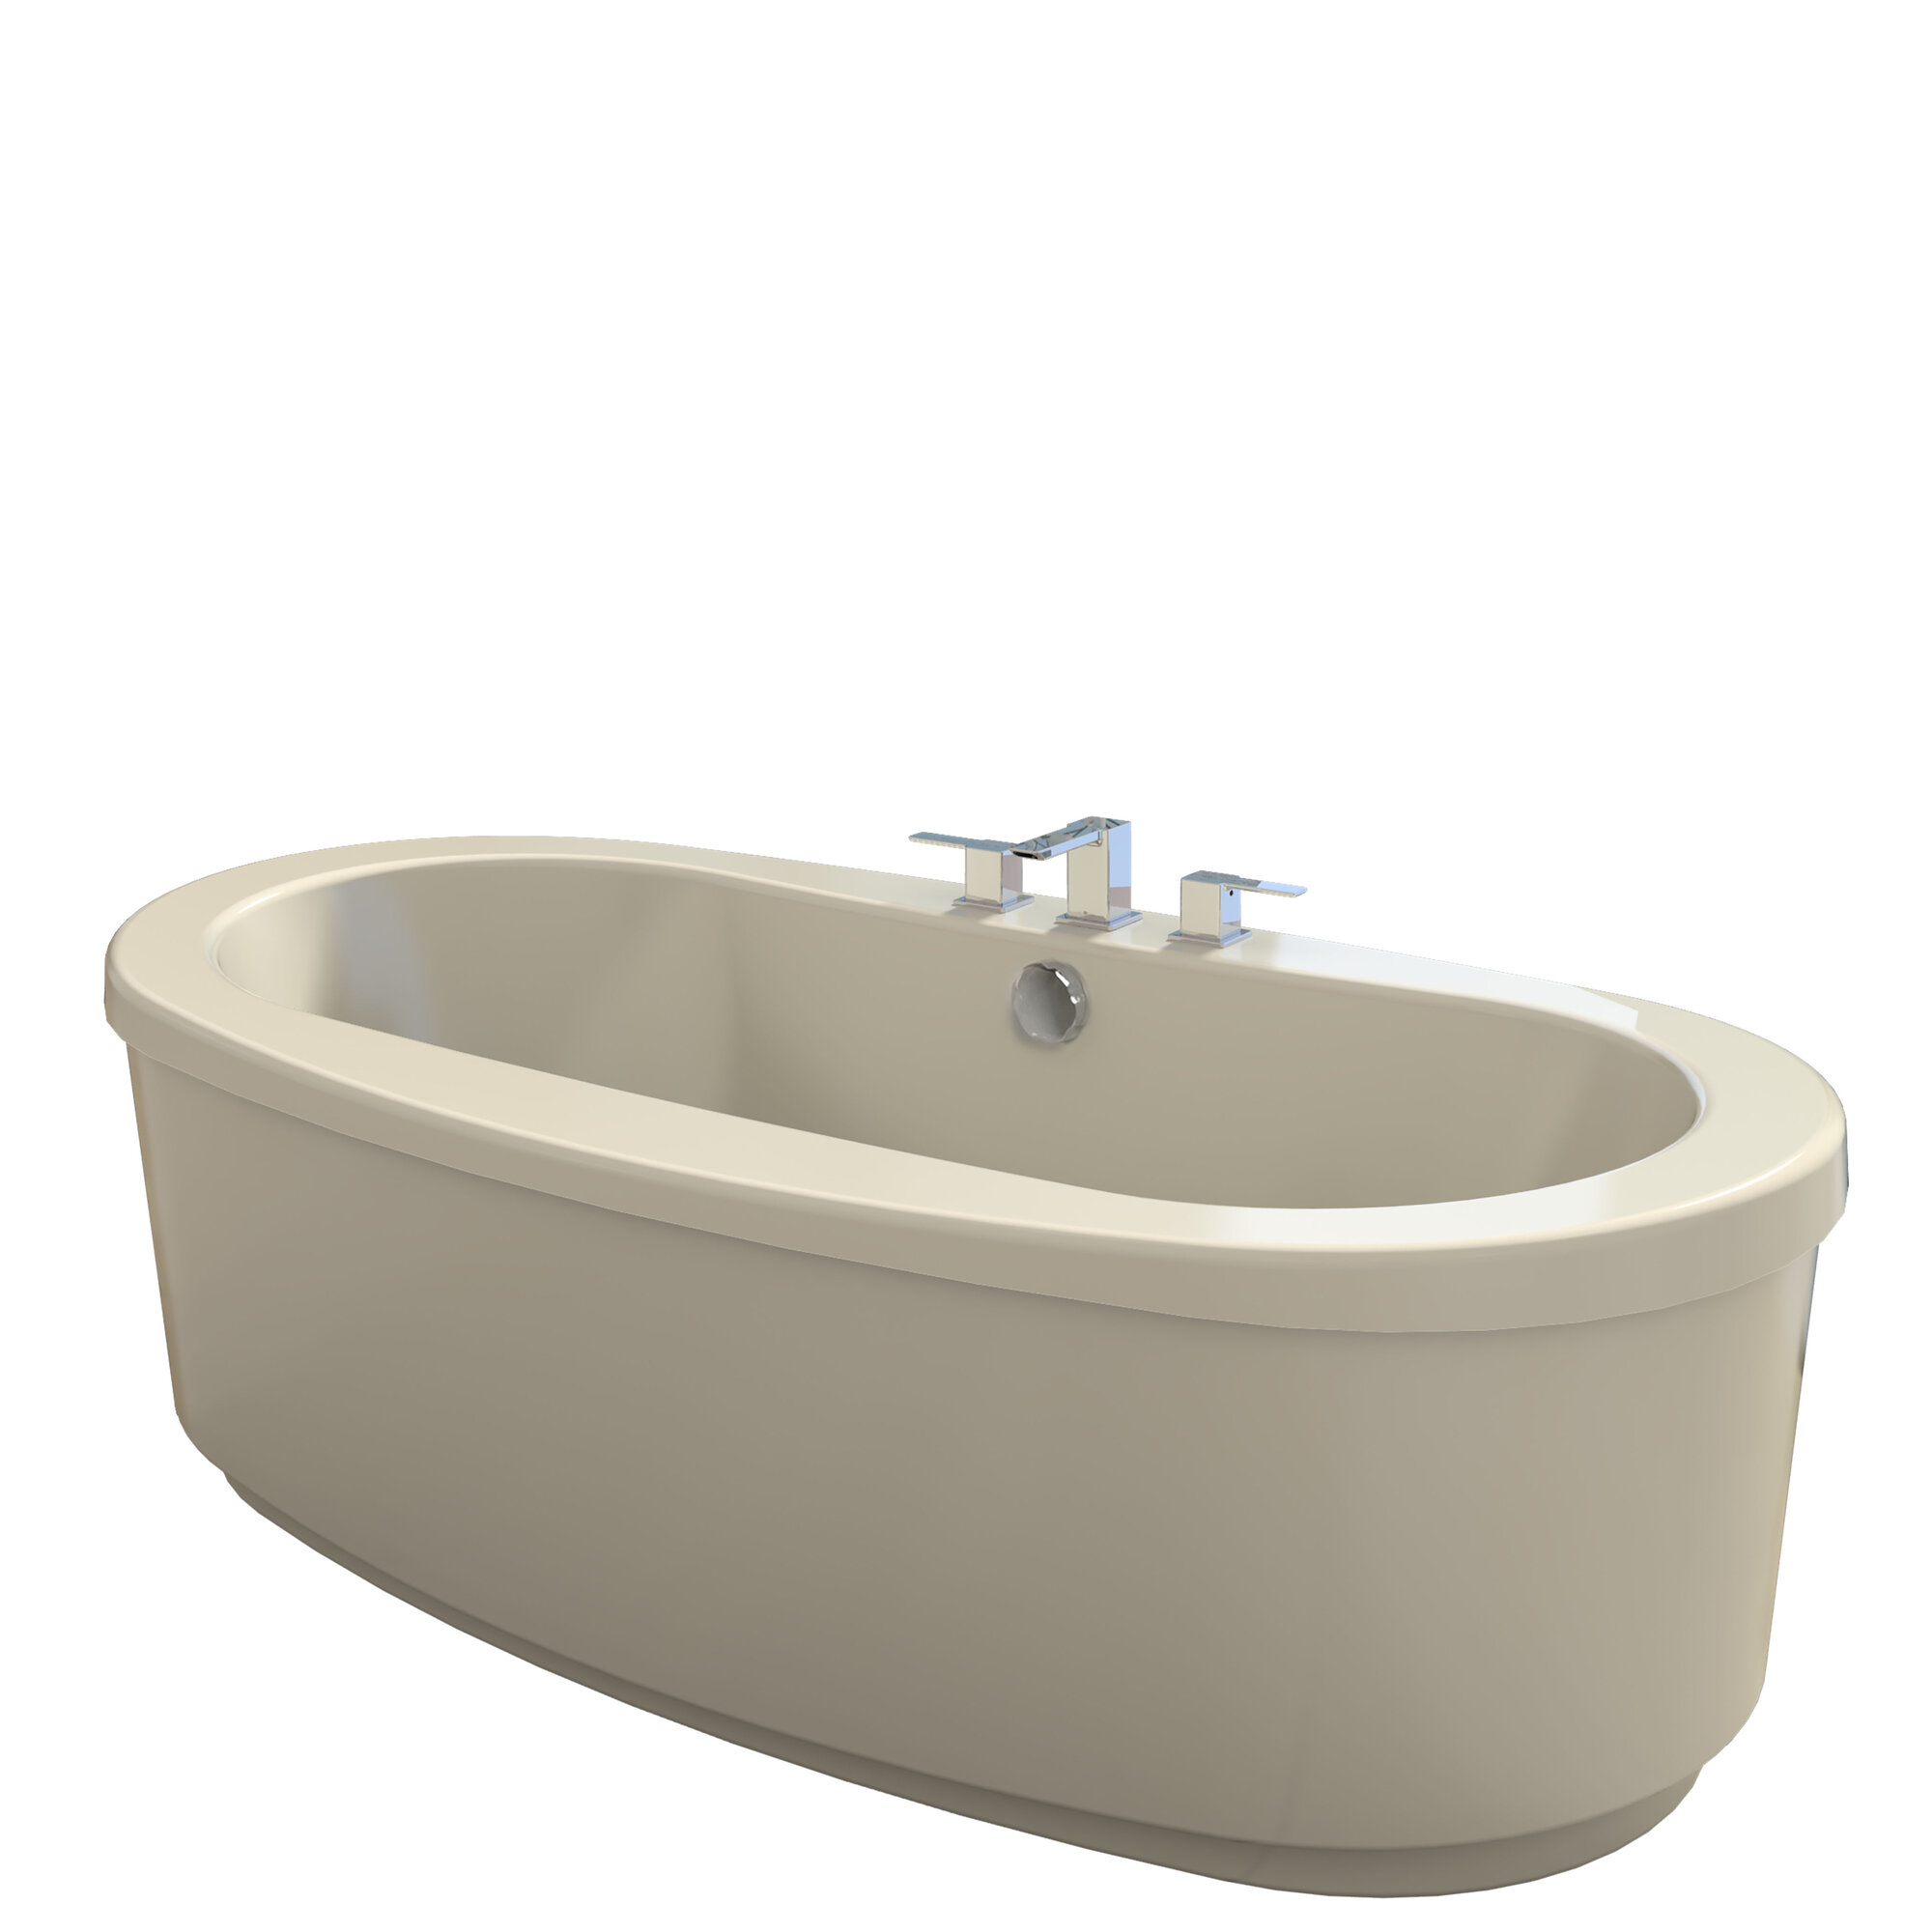 Jacuzzi 174 Bravo 66 Quot X 36 Quot Air Whirlpool Bathtub Ebay